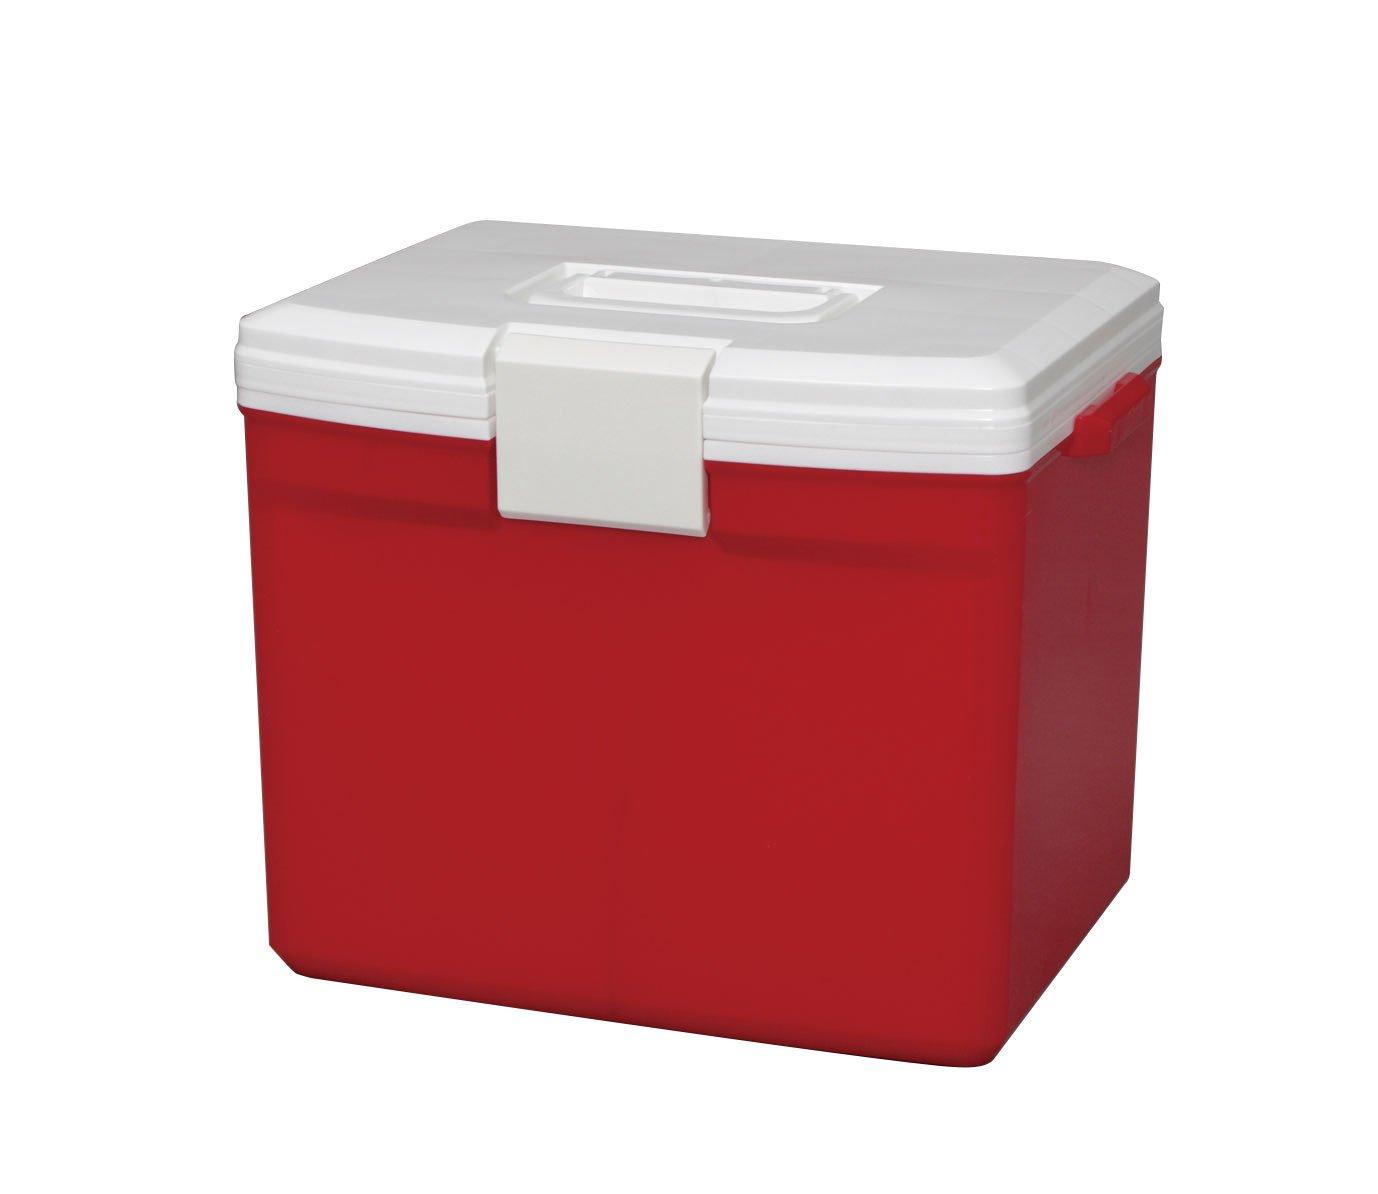 Iris Kühlbox cl-15 rot/weiß cl15rd